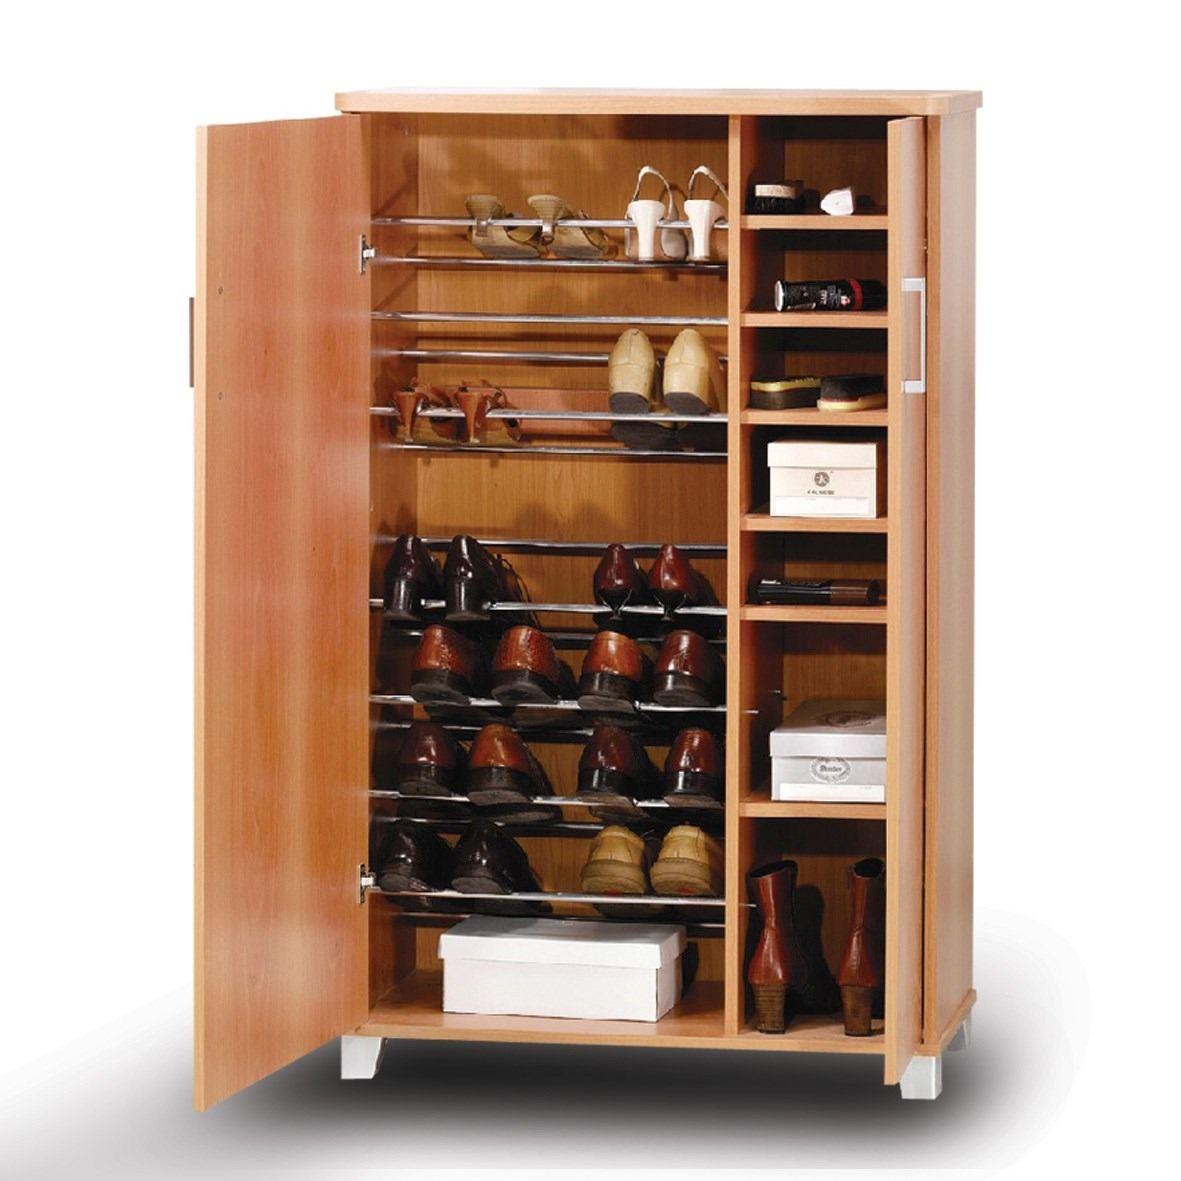 Muebles para poner zapatos buscar con google zapateras pinterest zapatera de madera - Muebles para zapatos ...